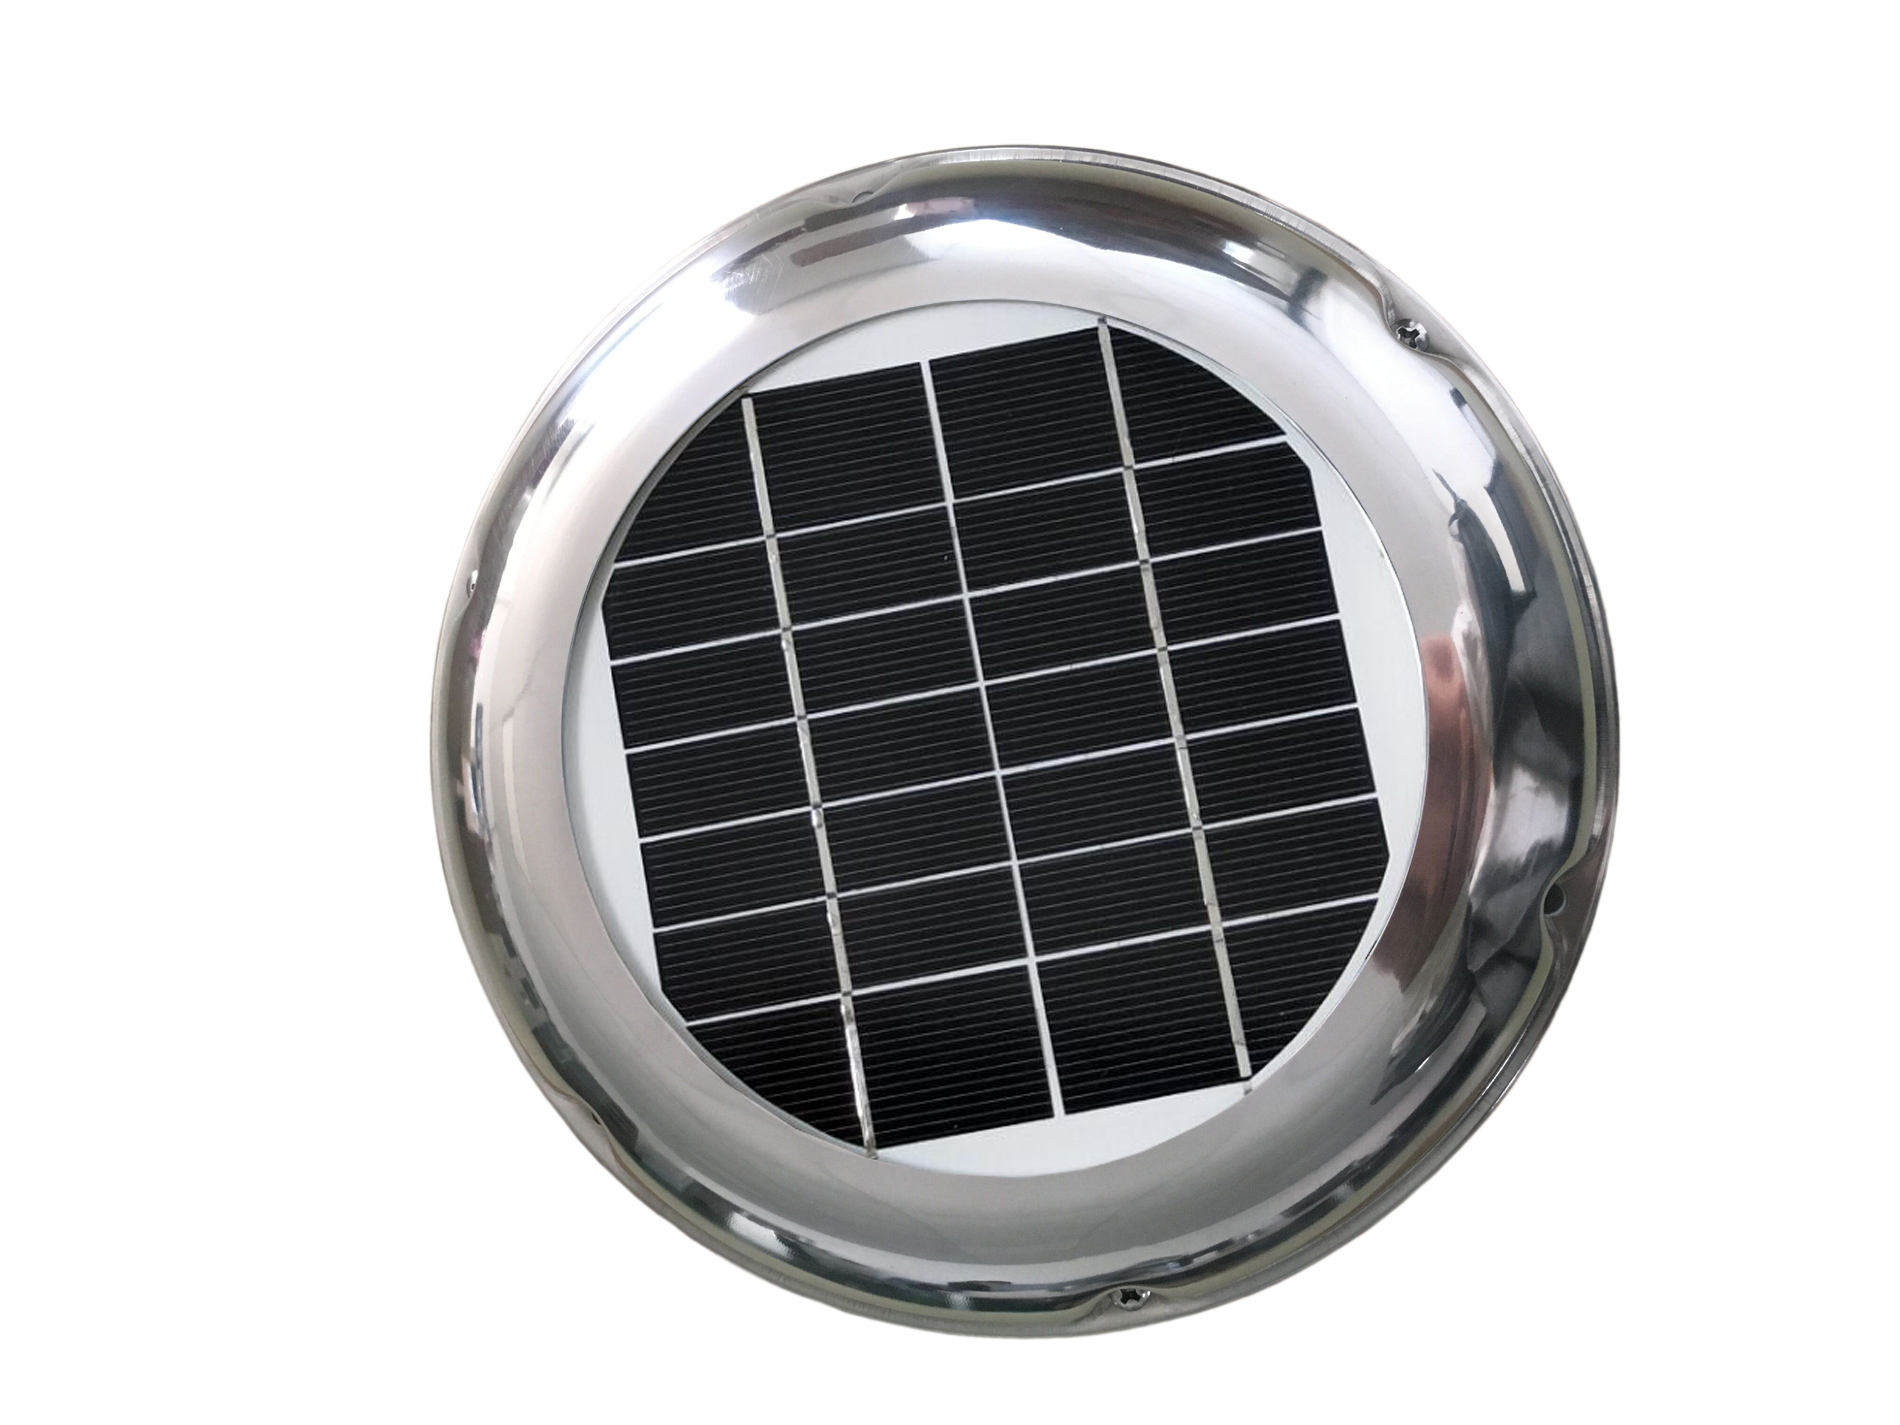 2.5W Solar Vent Fan Exhaust Ventilation Extractor 34CFM Waterproof ideal for RV Boat Caravan Greenhouse Portable Toilet